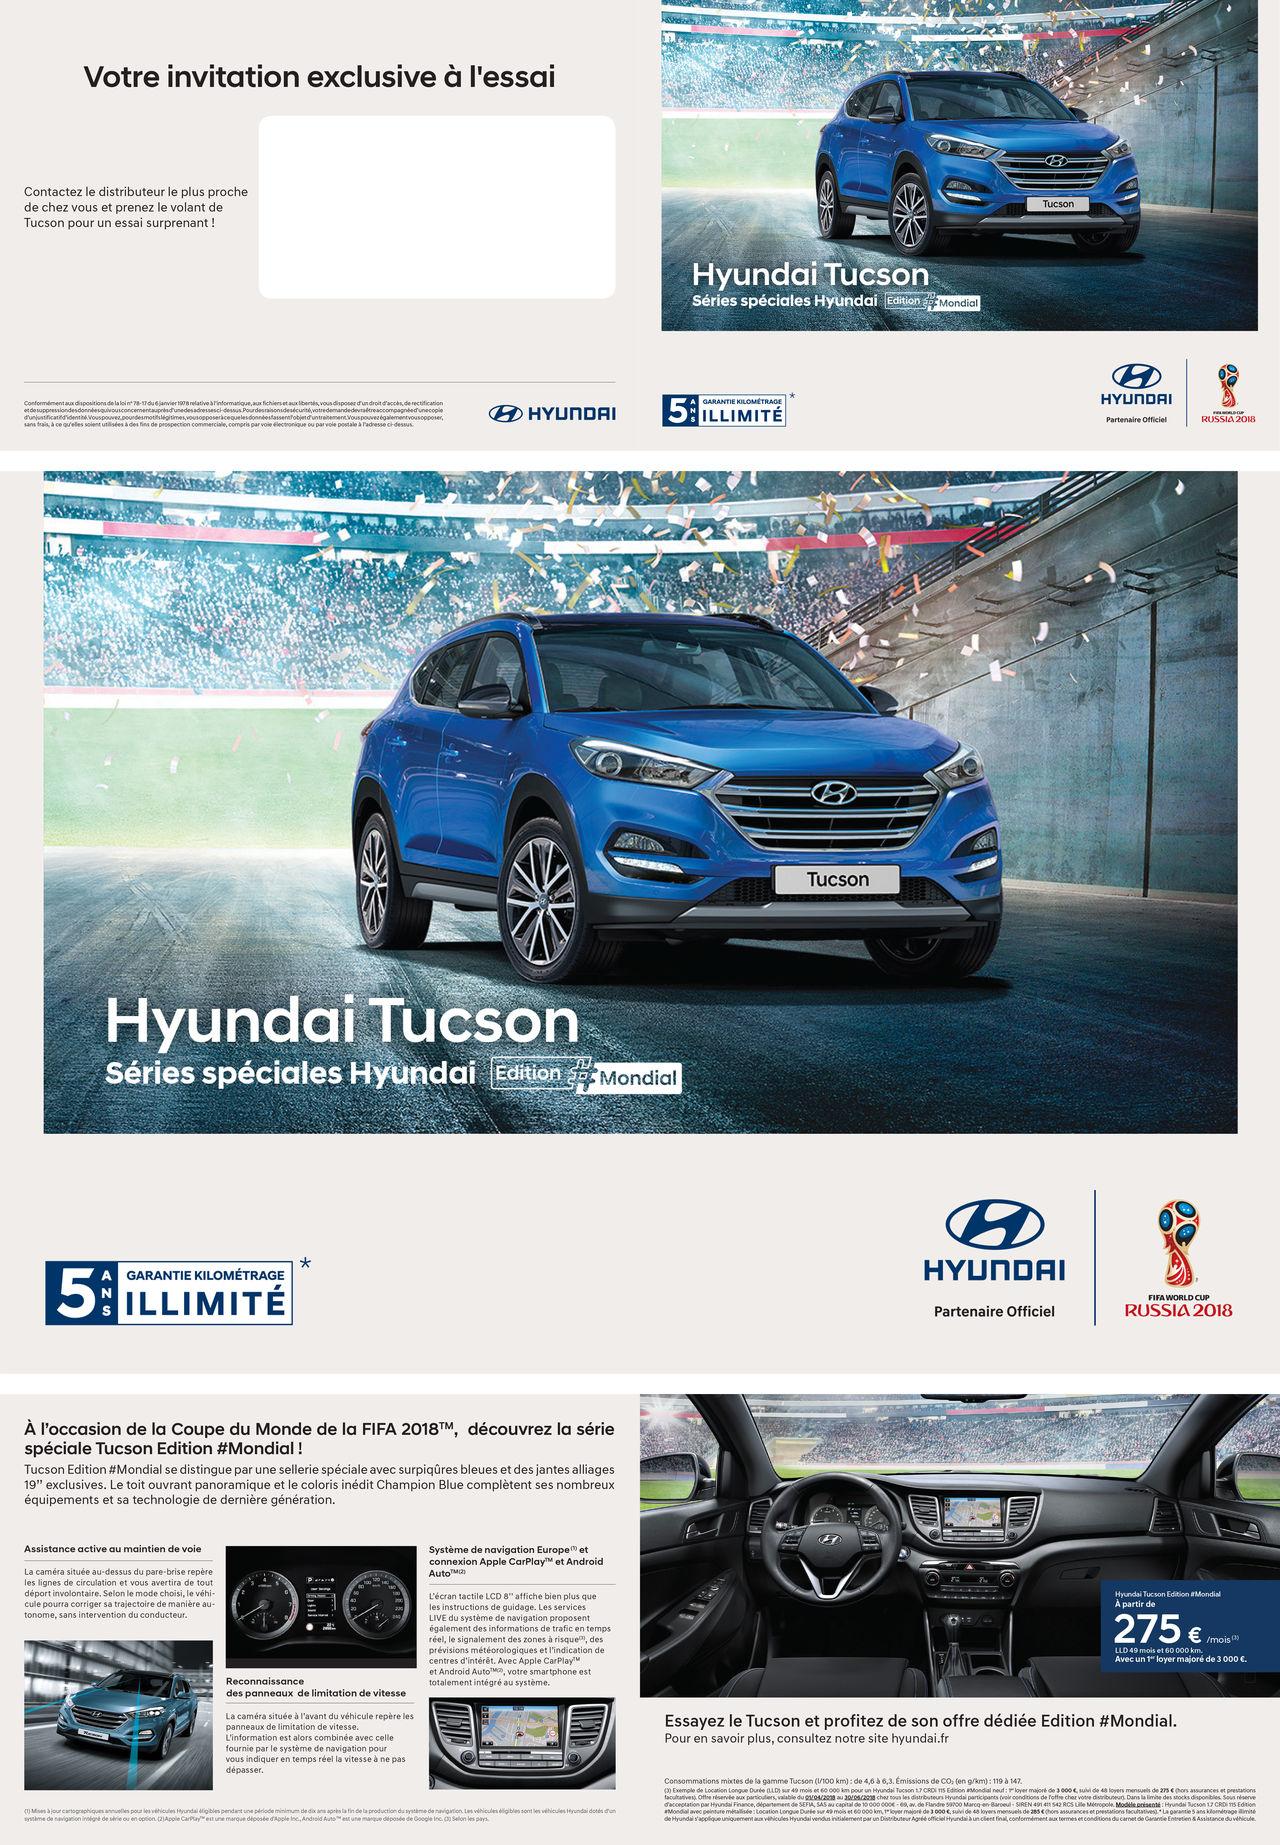 Hyundai - Série spéciale